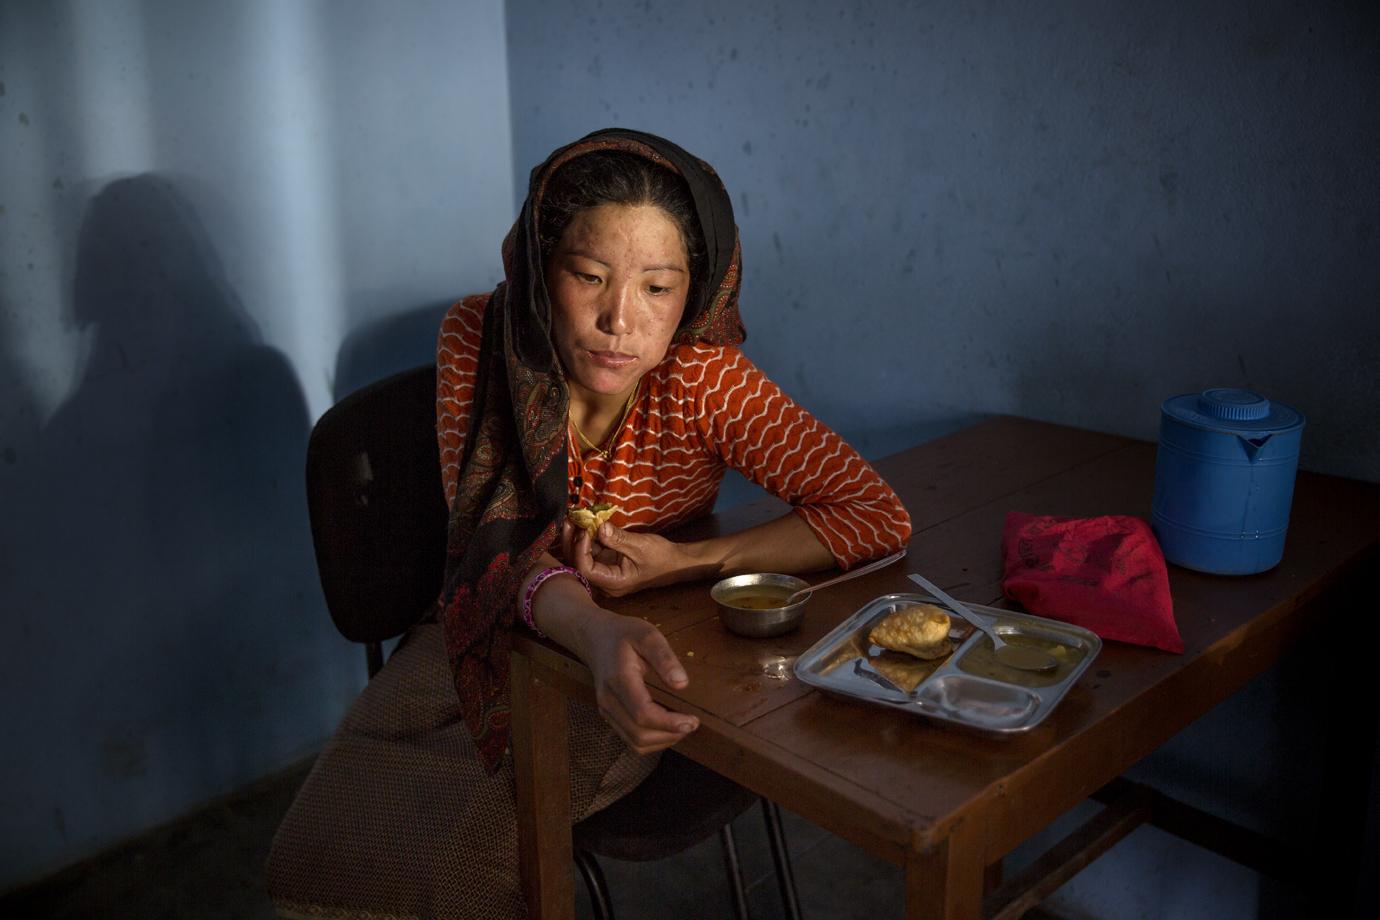 Earthquake surviver, Gurkha region / Nepal